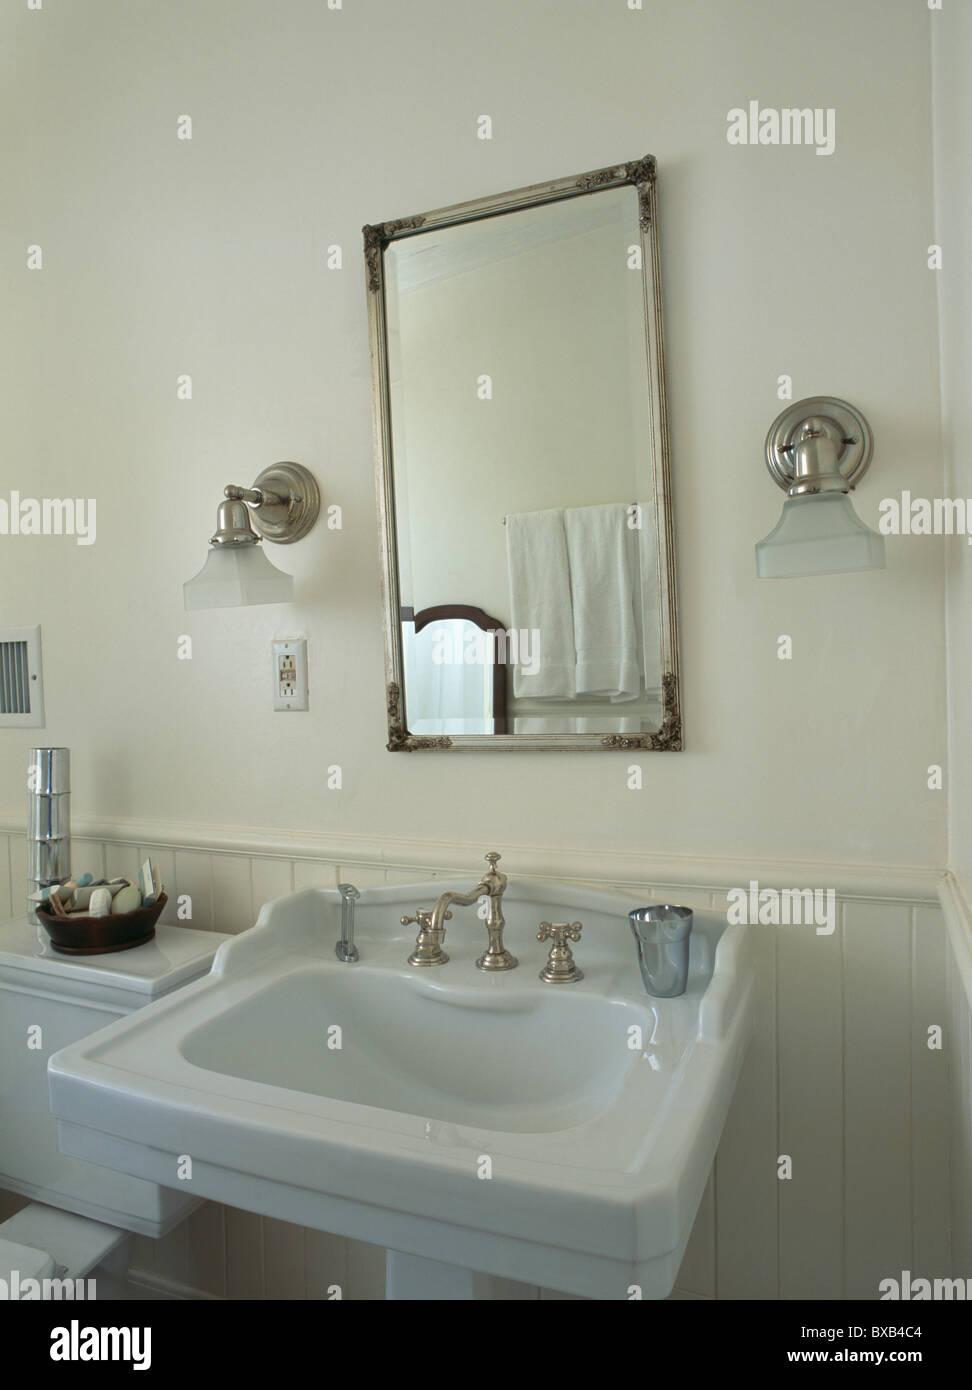 Victorian Style Basin Bathroom Stock Photos & Victorian Style Basin ...